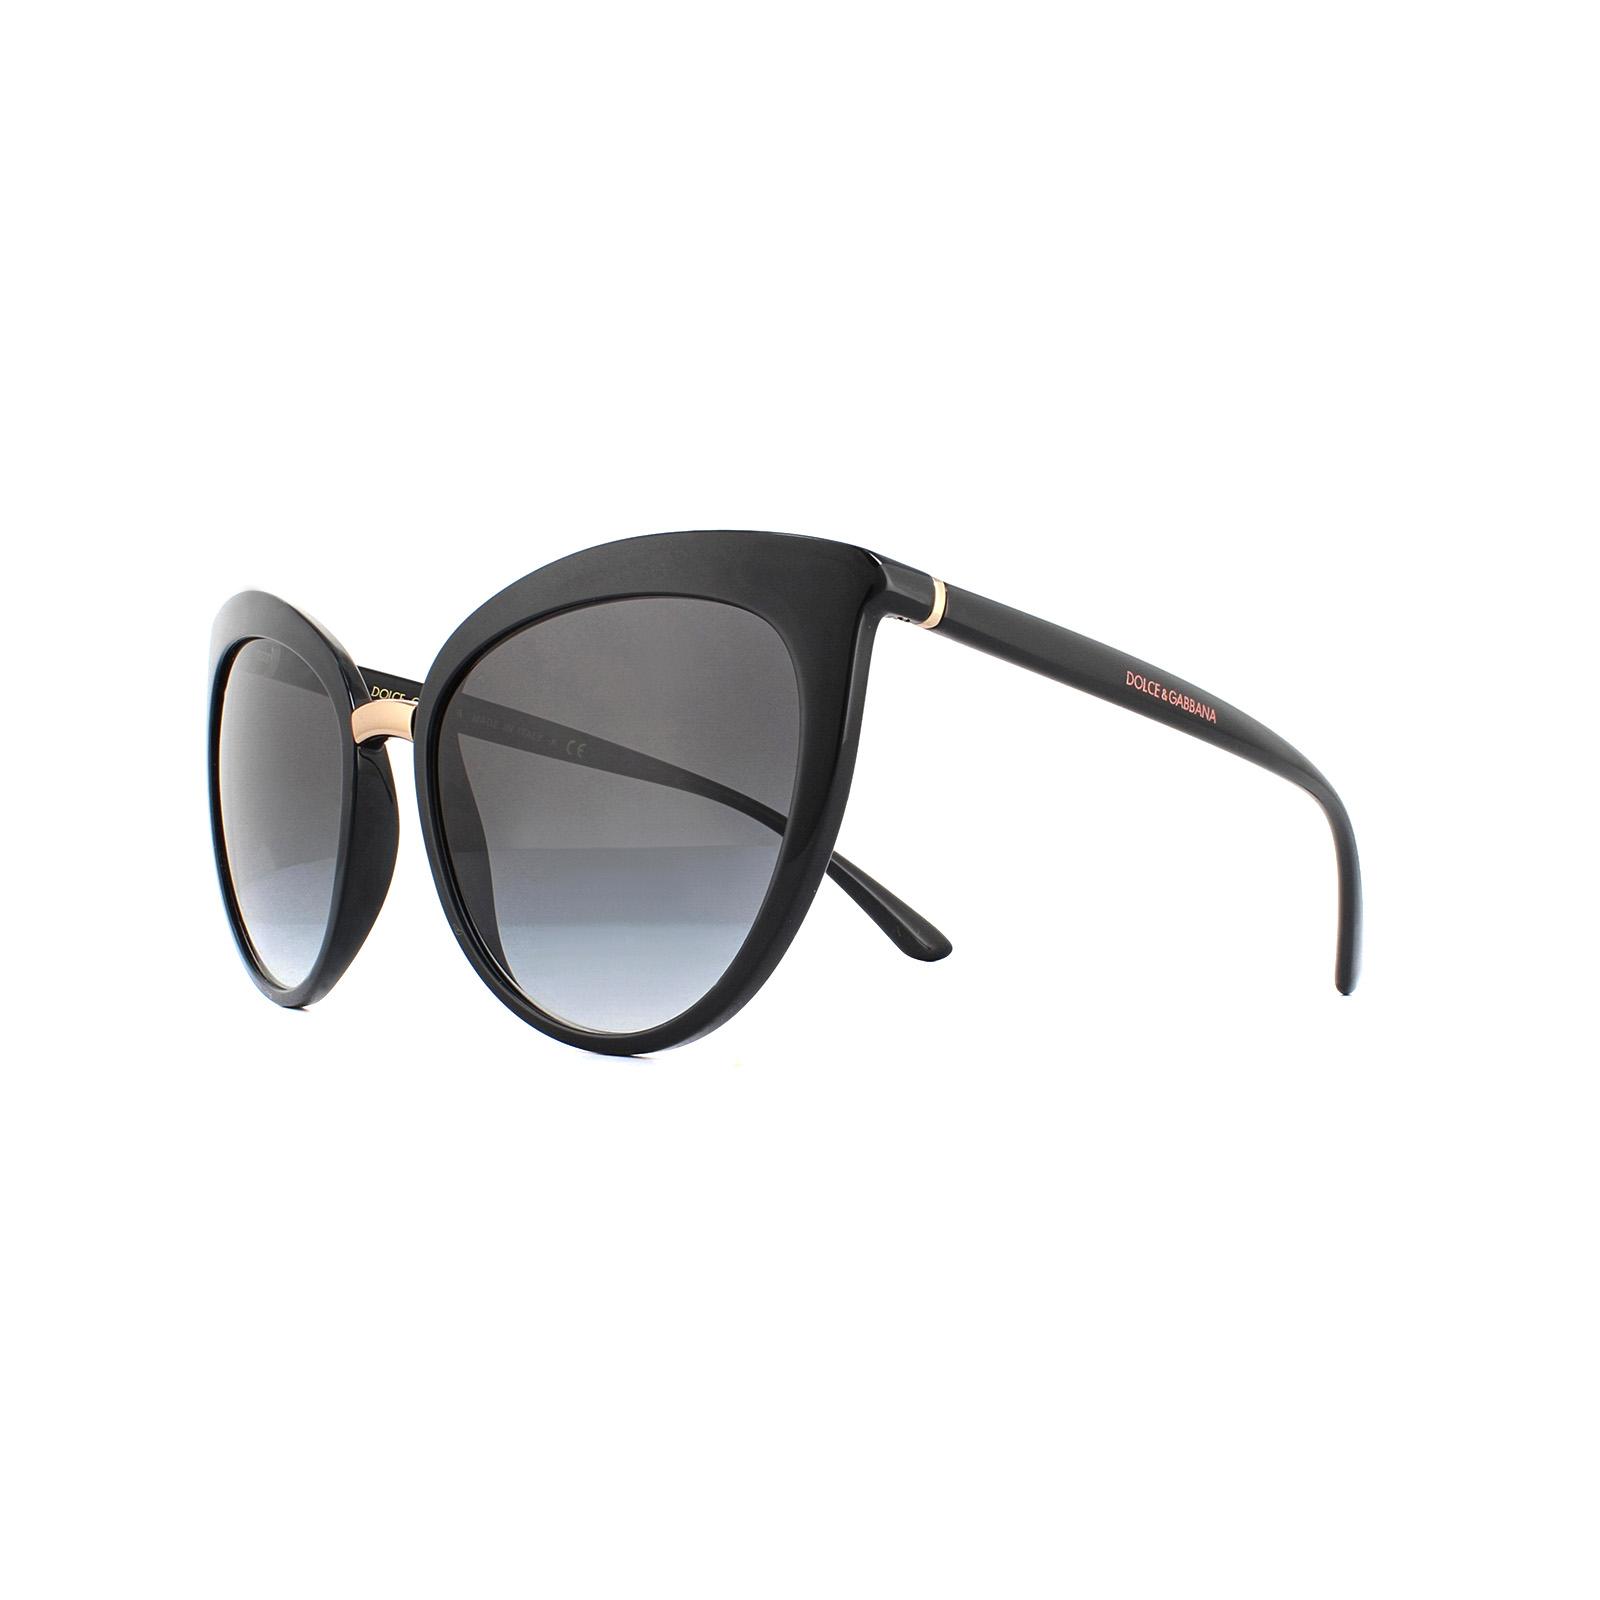 ee9728d4ccc7 Cheap Dolce & Gabbana DG6113 Sunglasses - Discounted Sunglasses